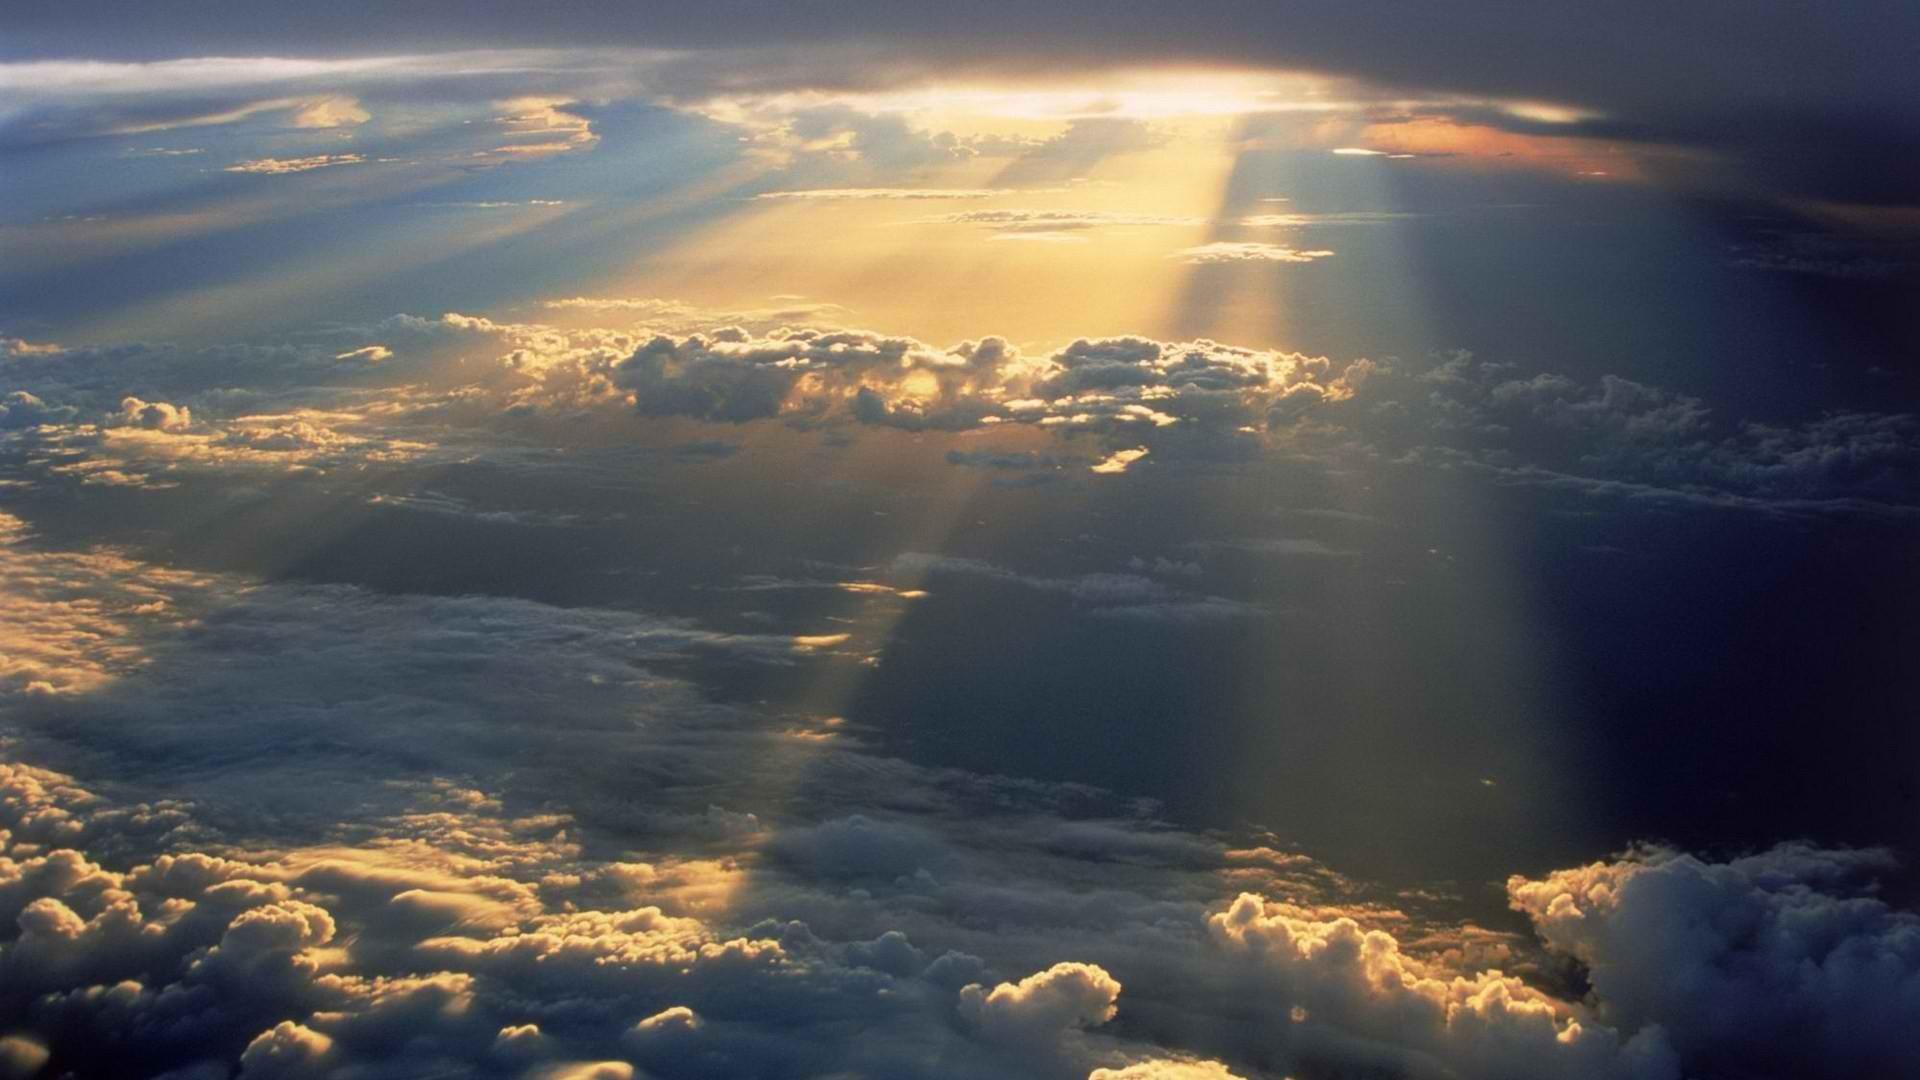 heaven backgrounds screensavers wallpaper - photo #9